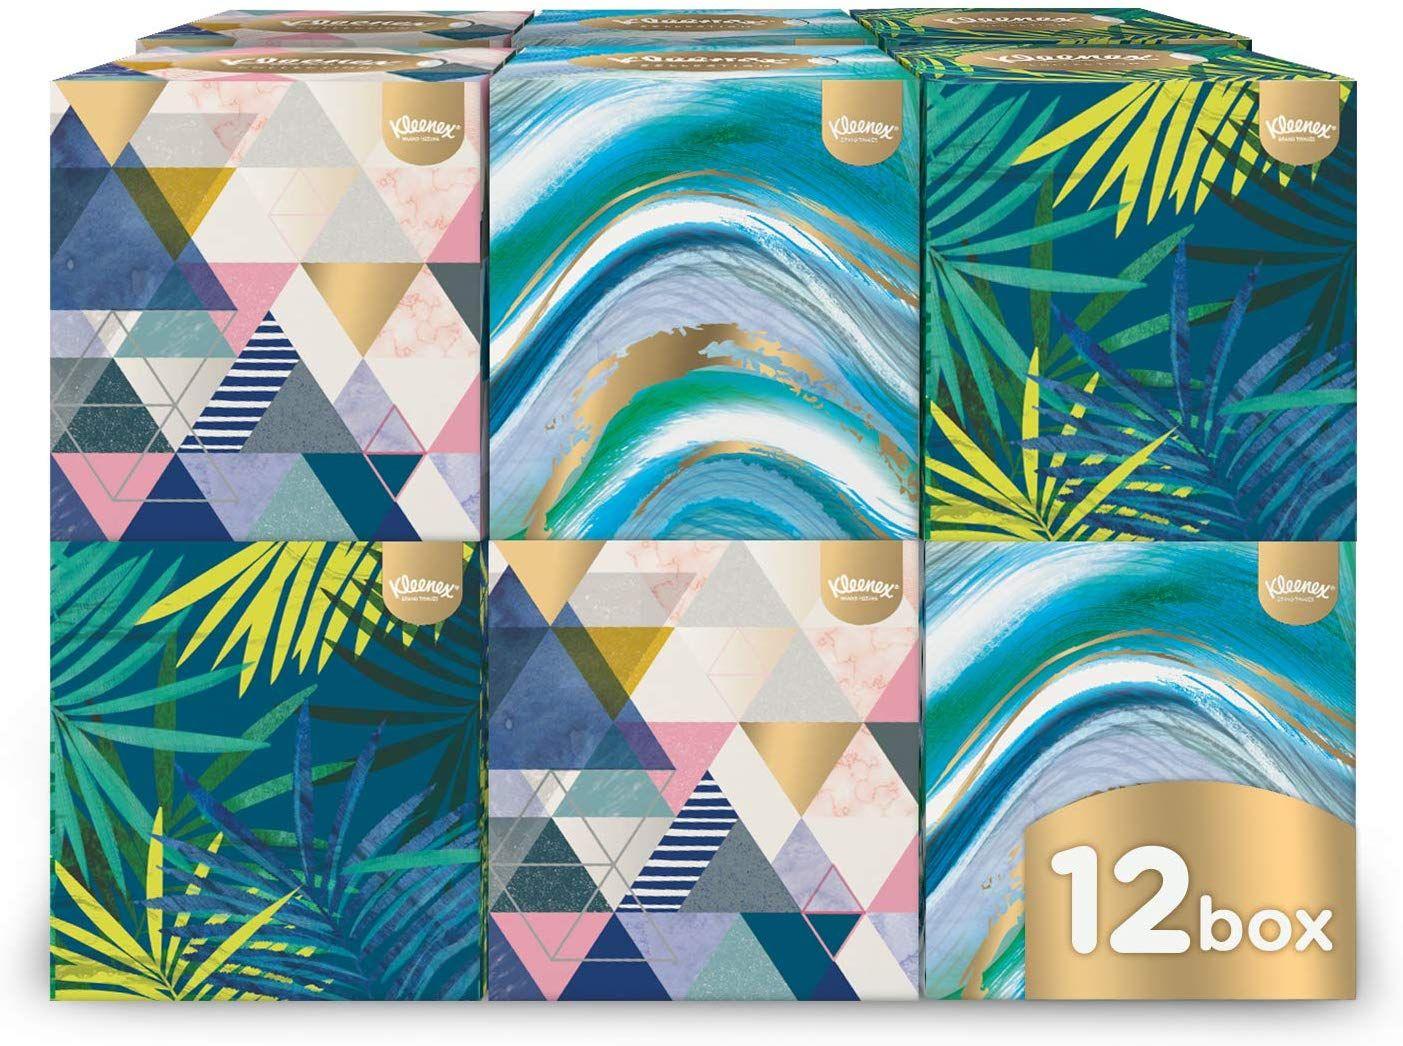 Kleenex Collection Cube - 12 Boxes @ Amazon - £5.40 Prime / £9.99 non-Prime